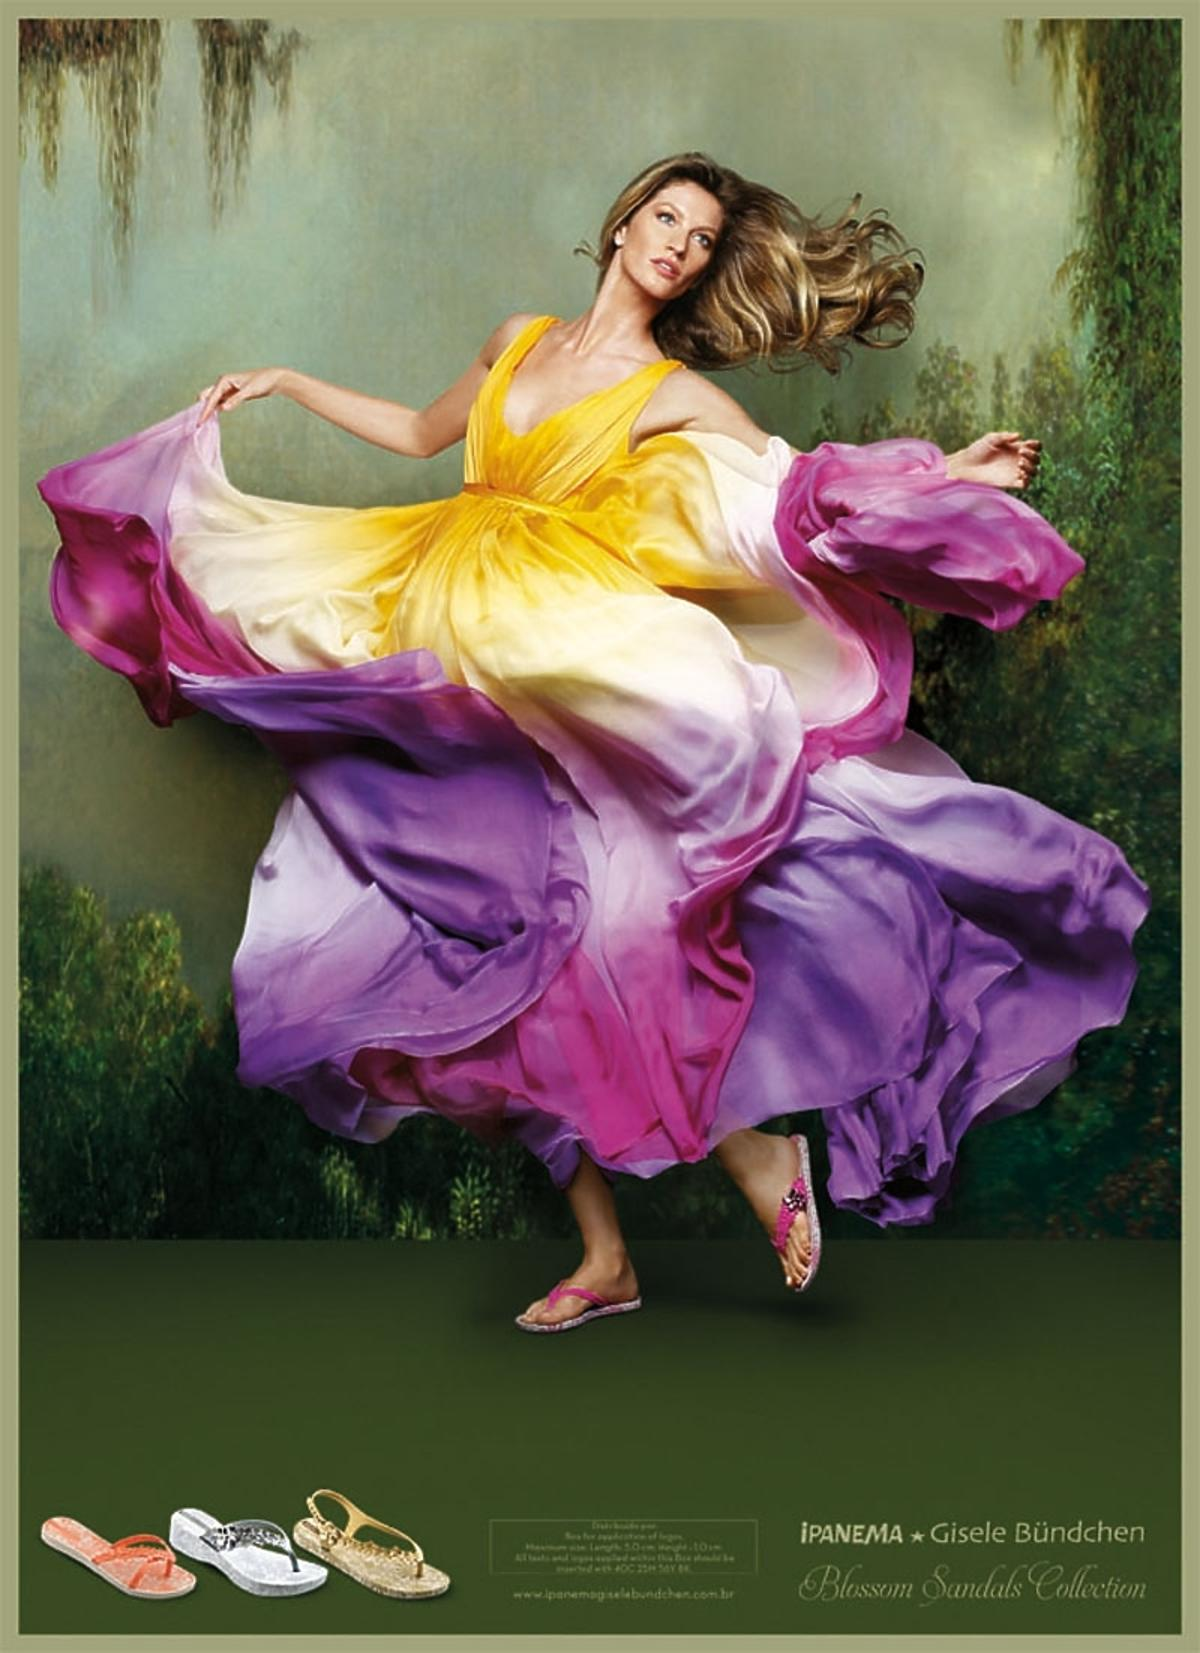 Advertising_Ipanema_GB_Flowers_Pagina_Simples.jpg